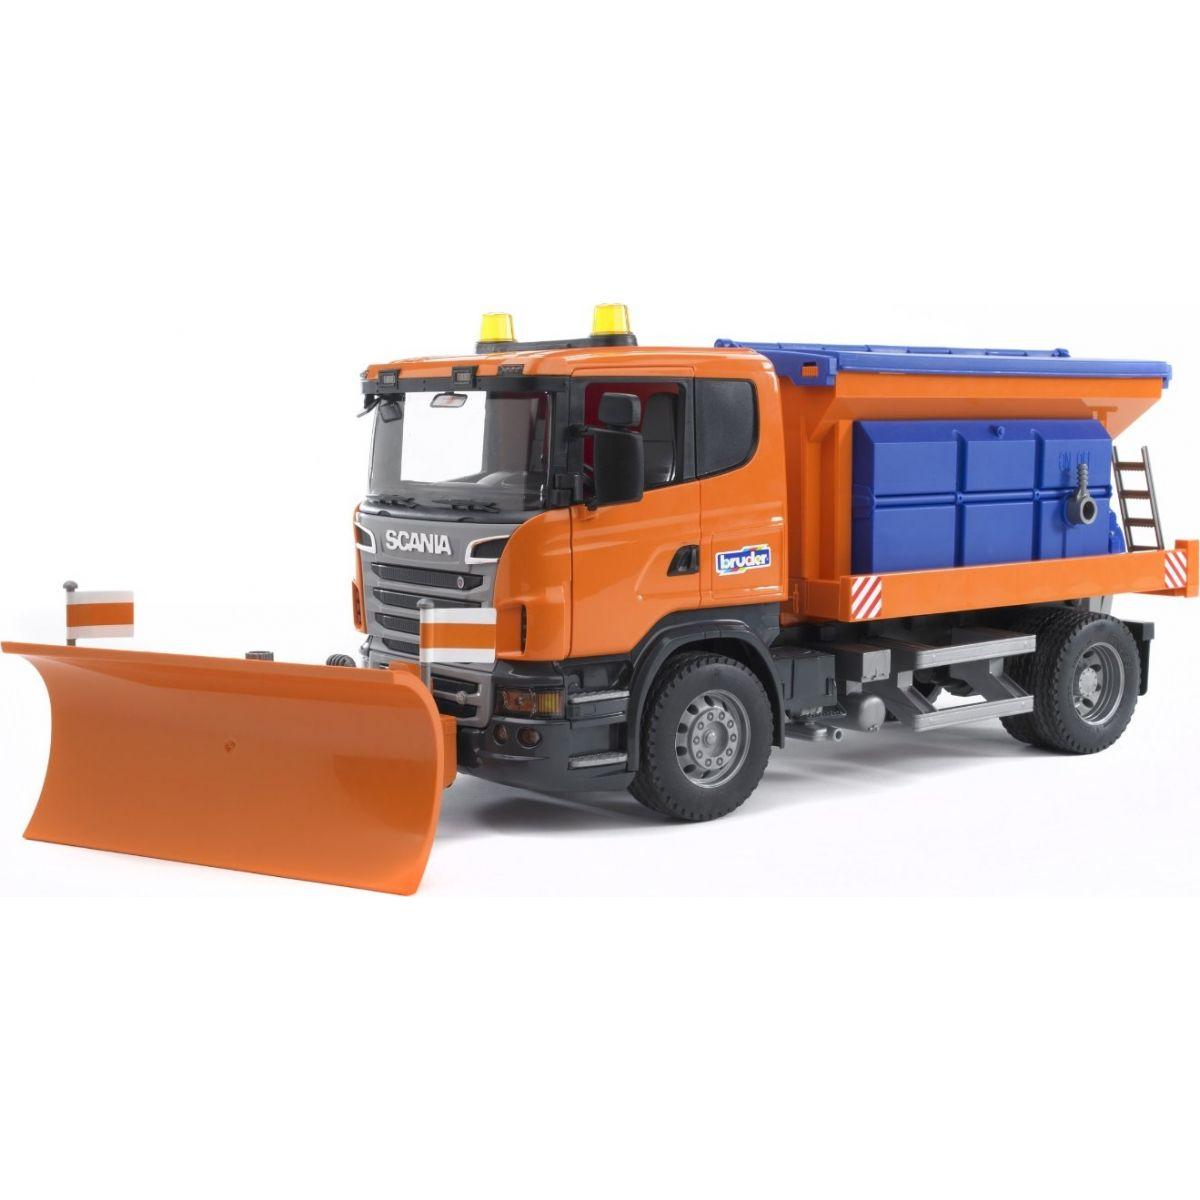 Bruder 03585 Nákladní auto Scania sypač s radlicí